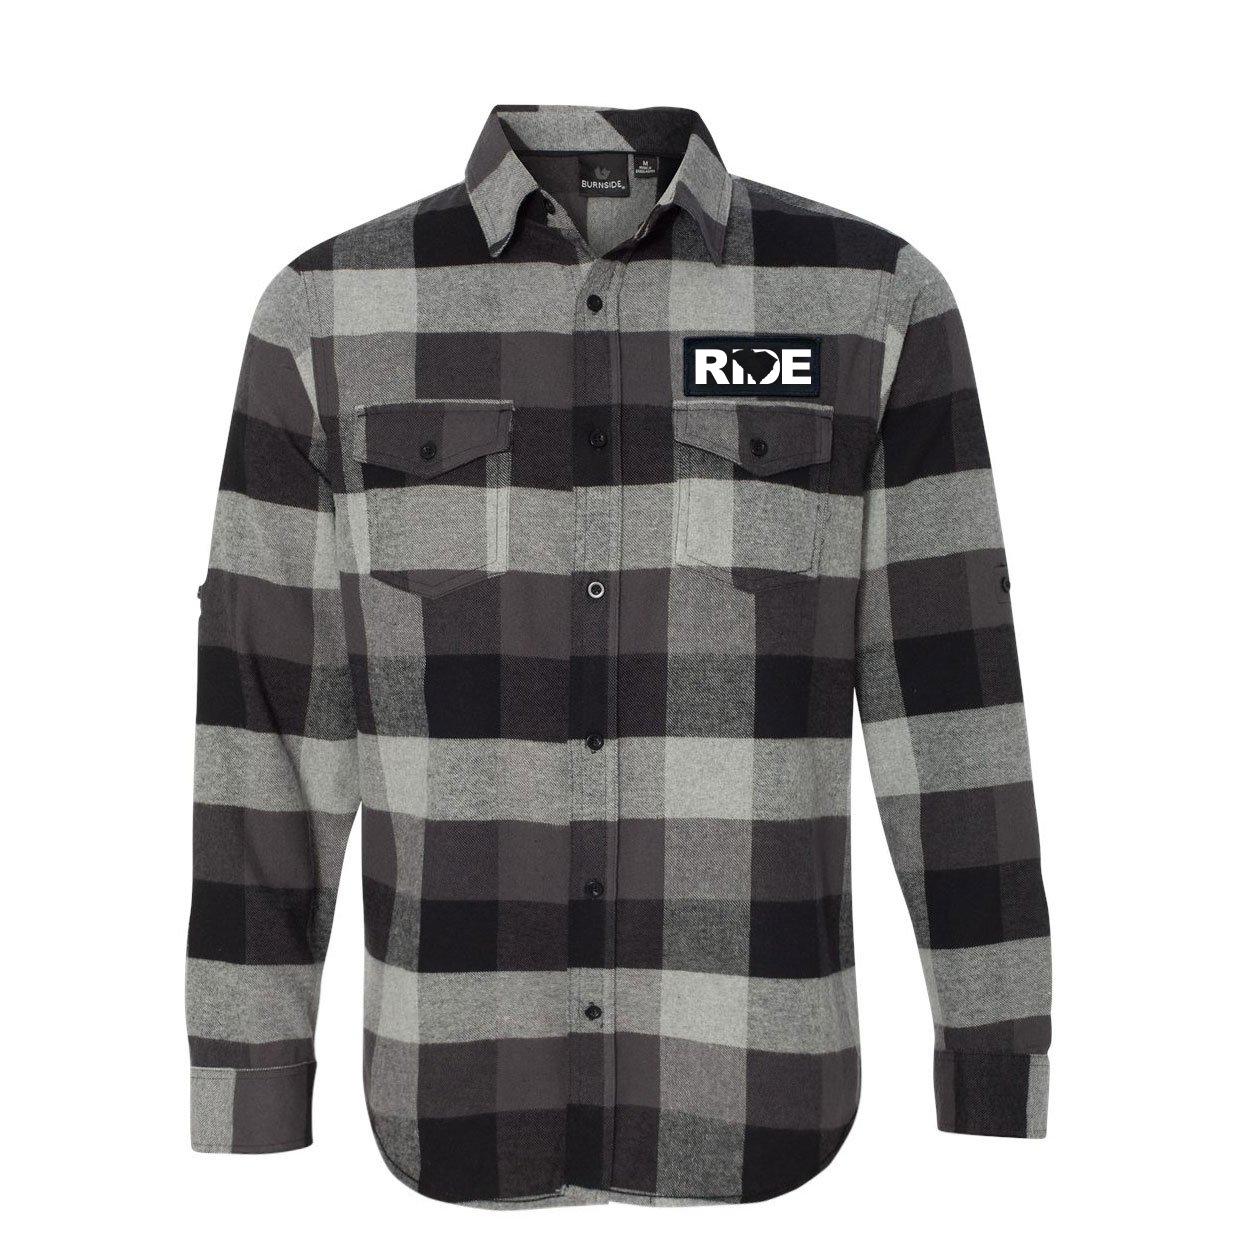 Ride South Carolina Classic Unisex Long Sleeve Woven Patch Flannel Shirt Black/Gray (White Logo)